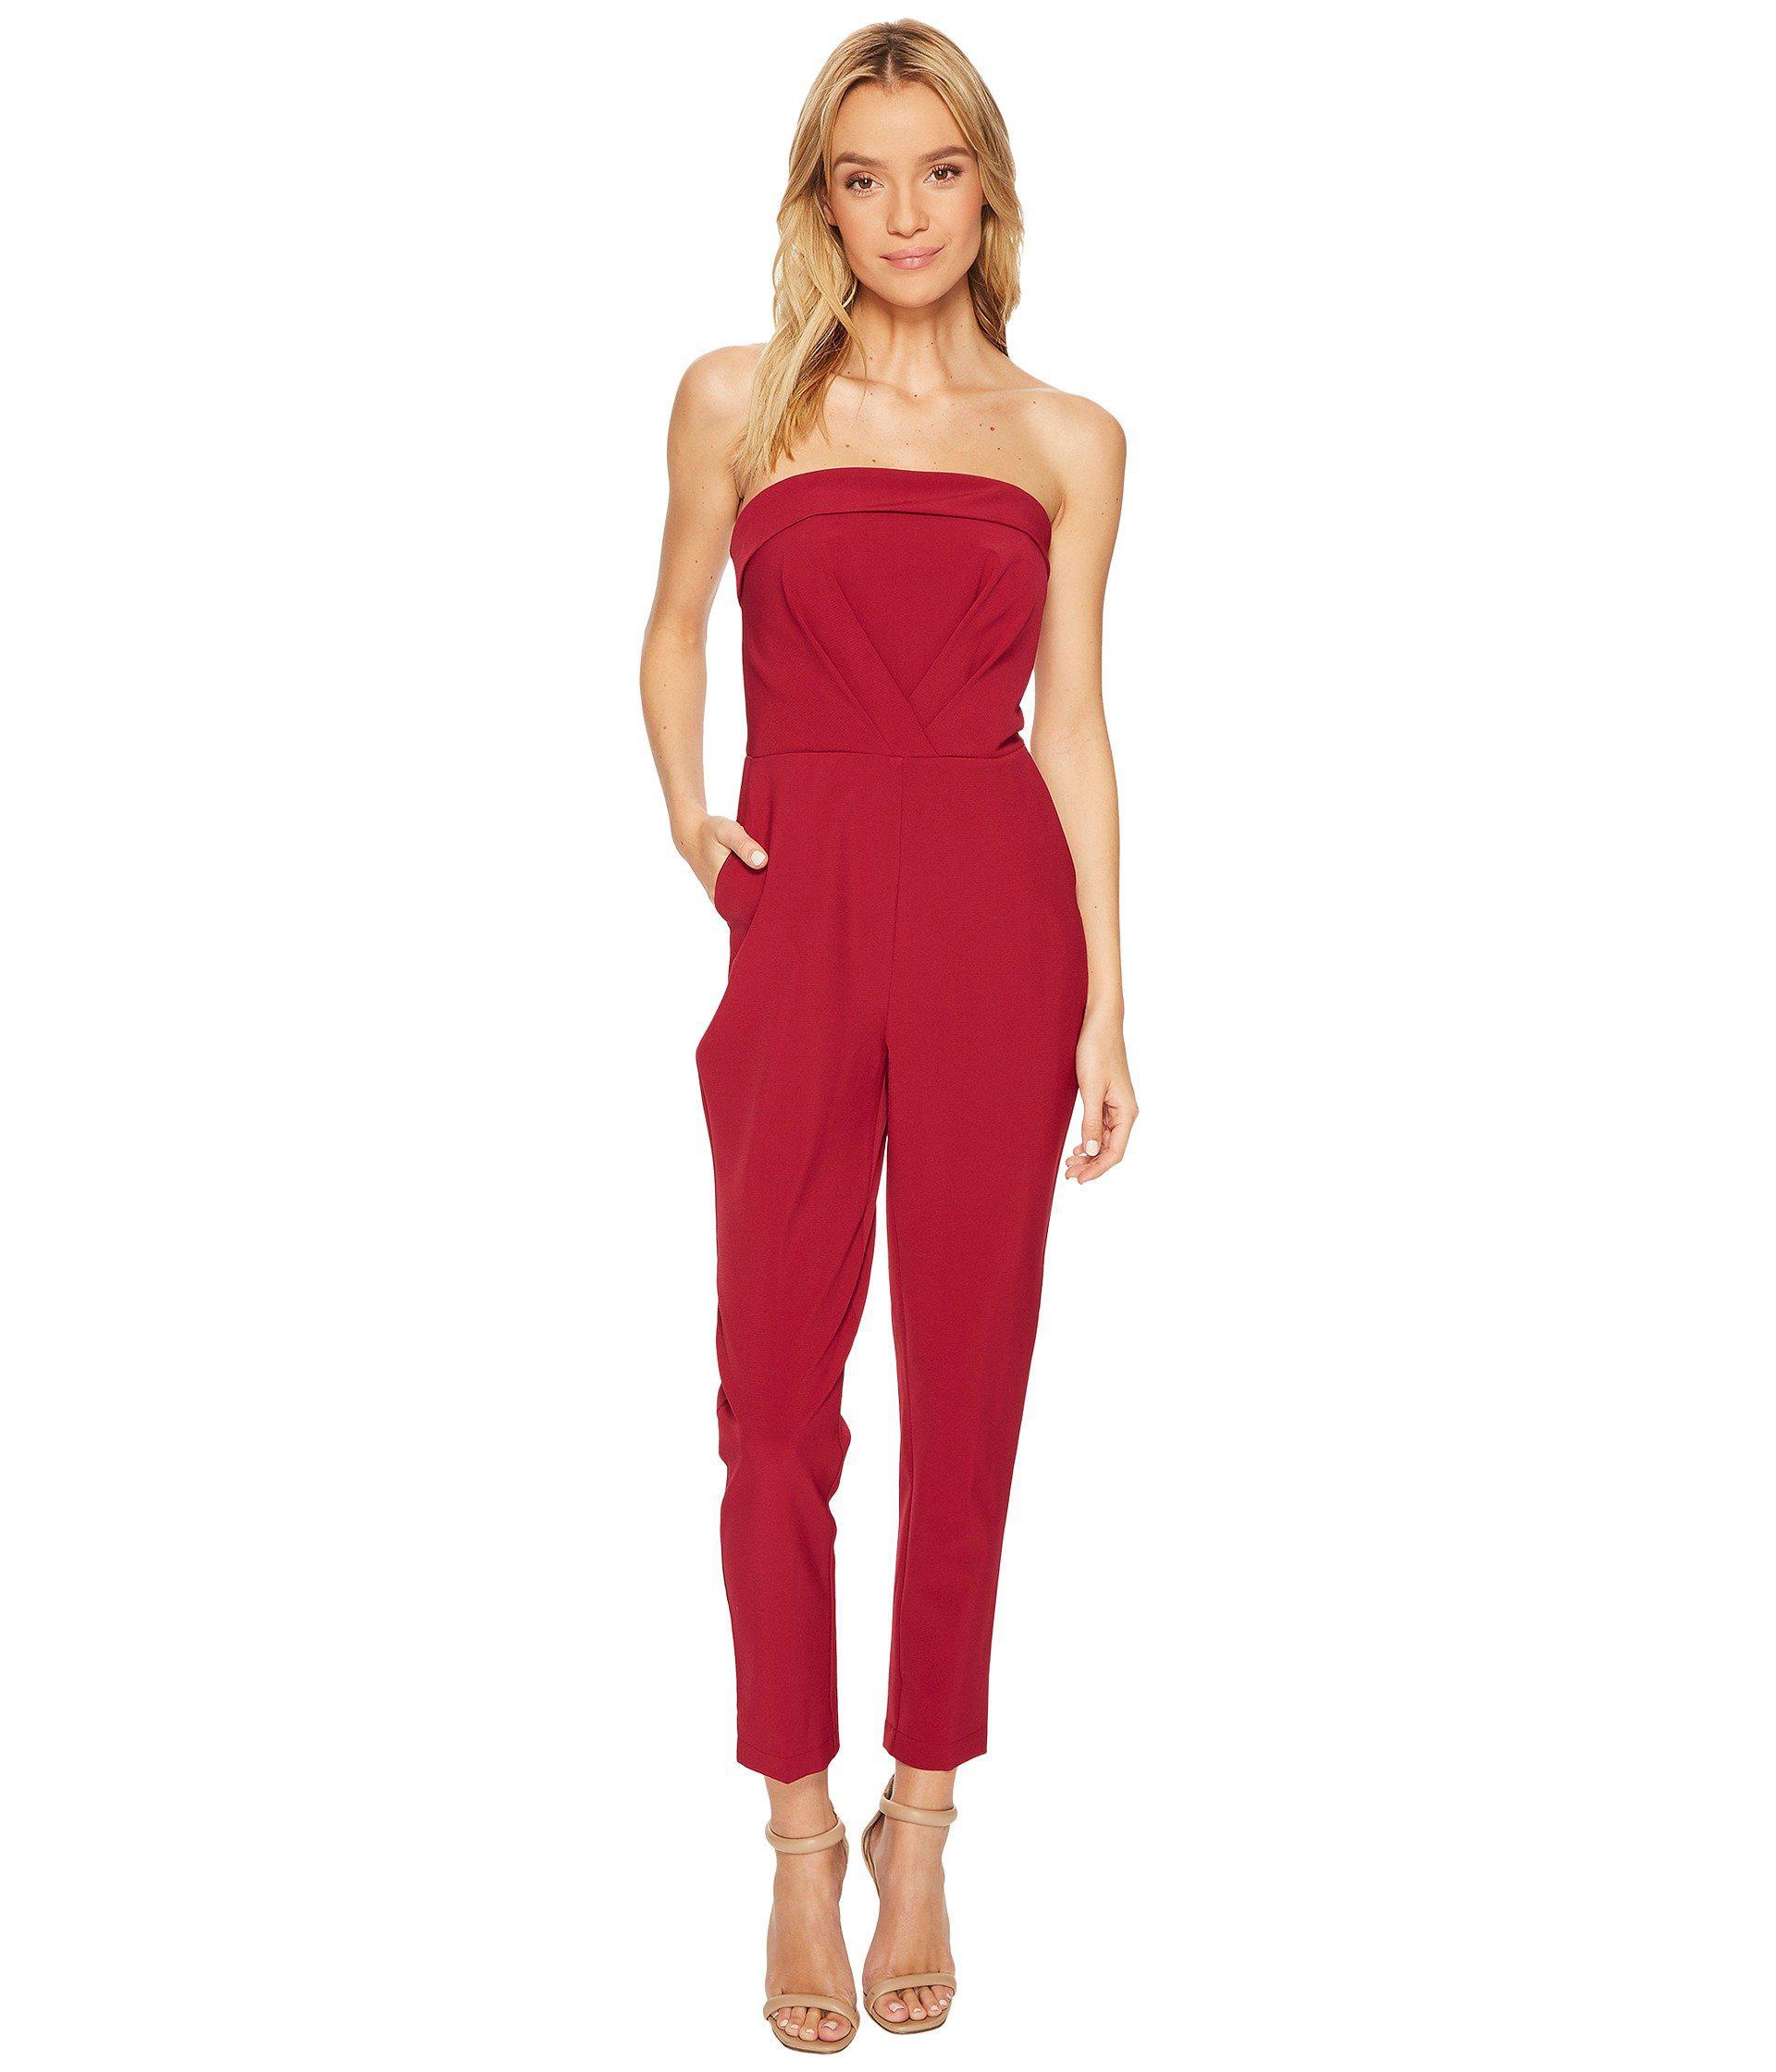 abf6b776e9e Lyst - Adelyn Rae Malia Jumpsuit in Red